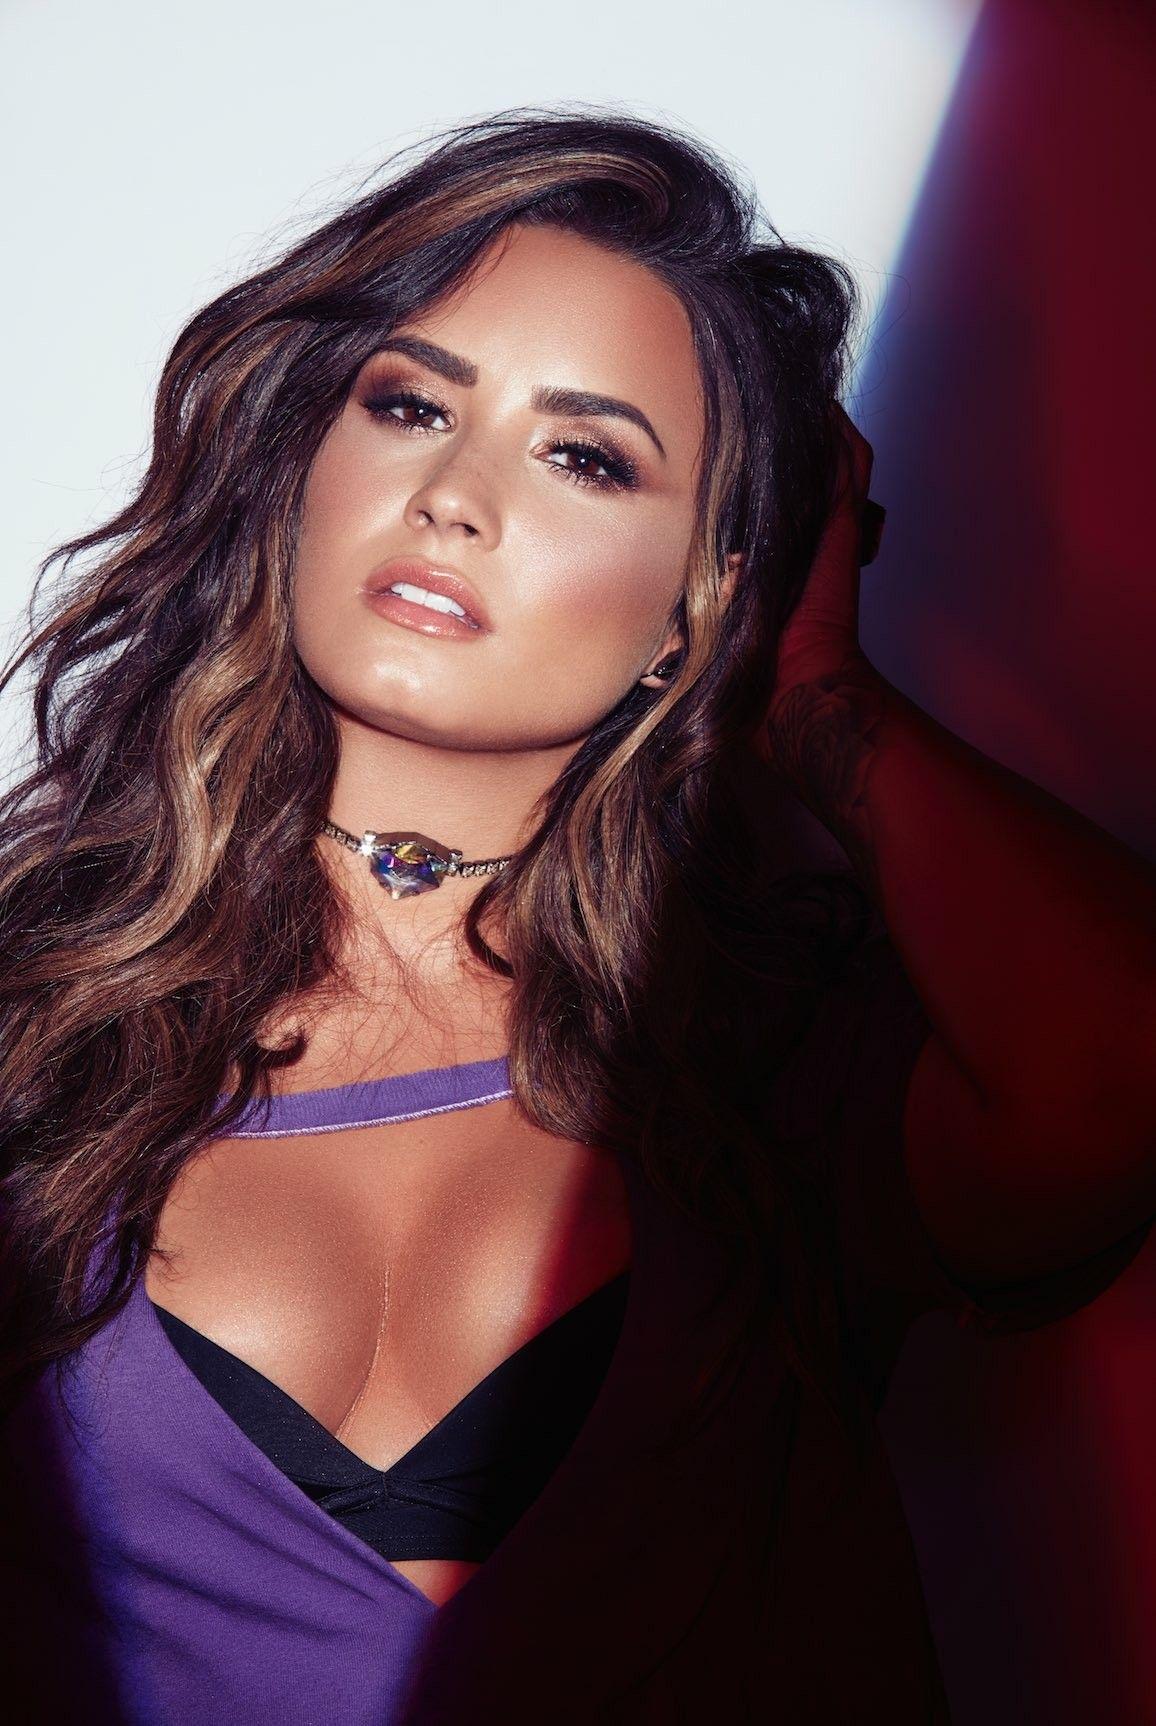 Celebrites Demi Lovato nudes (66 photos), Pussy, Paparazzi, Feet, cleavage 2020